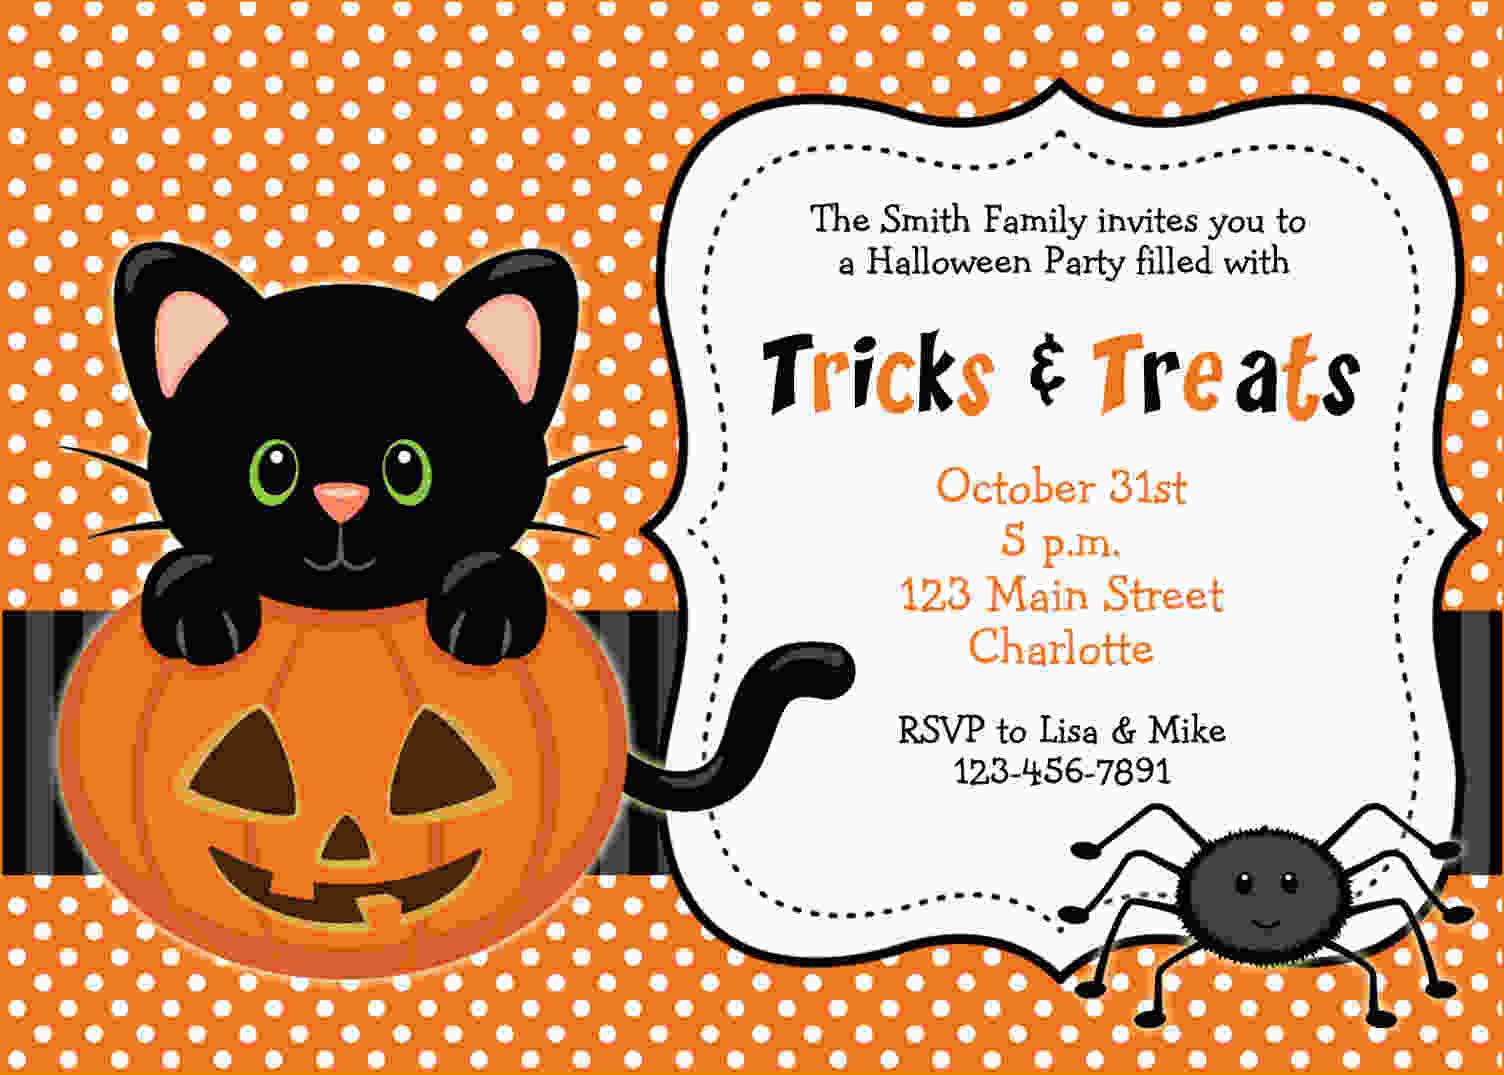 Halloween Birthday Party Invitation Ideas  FREE Printable Halloween Invitations Templates